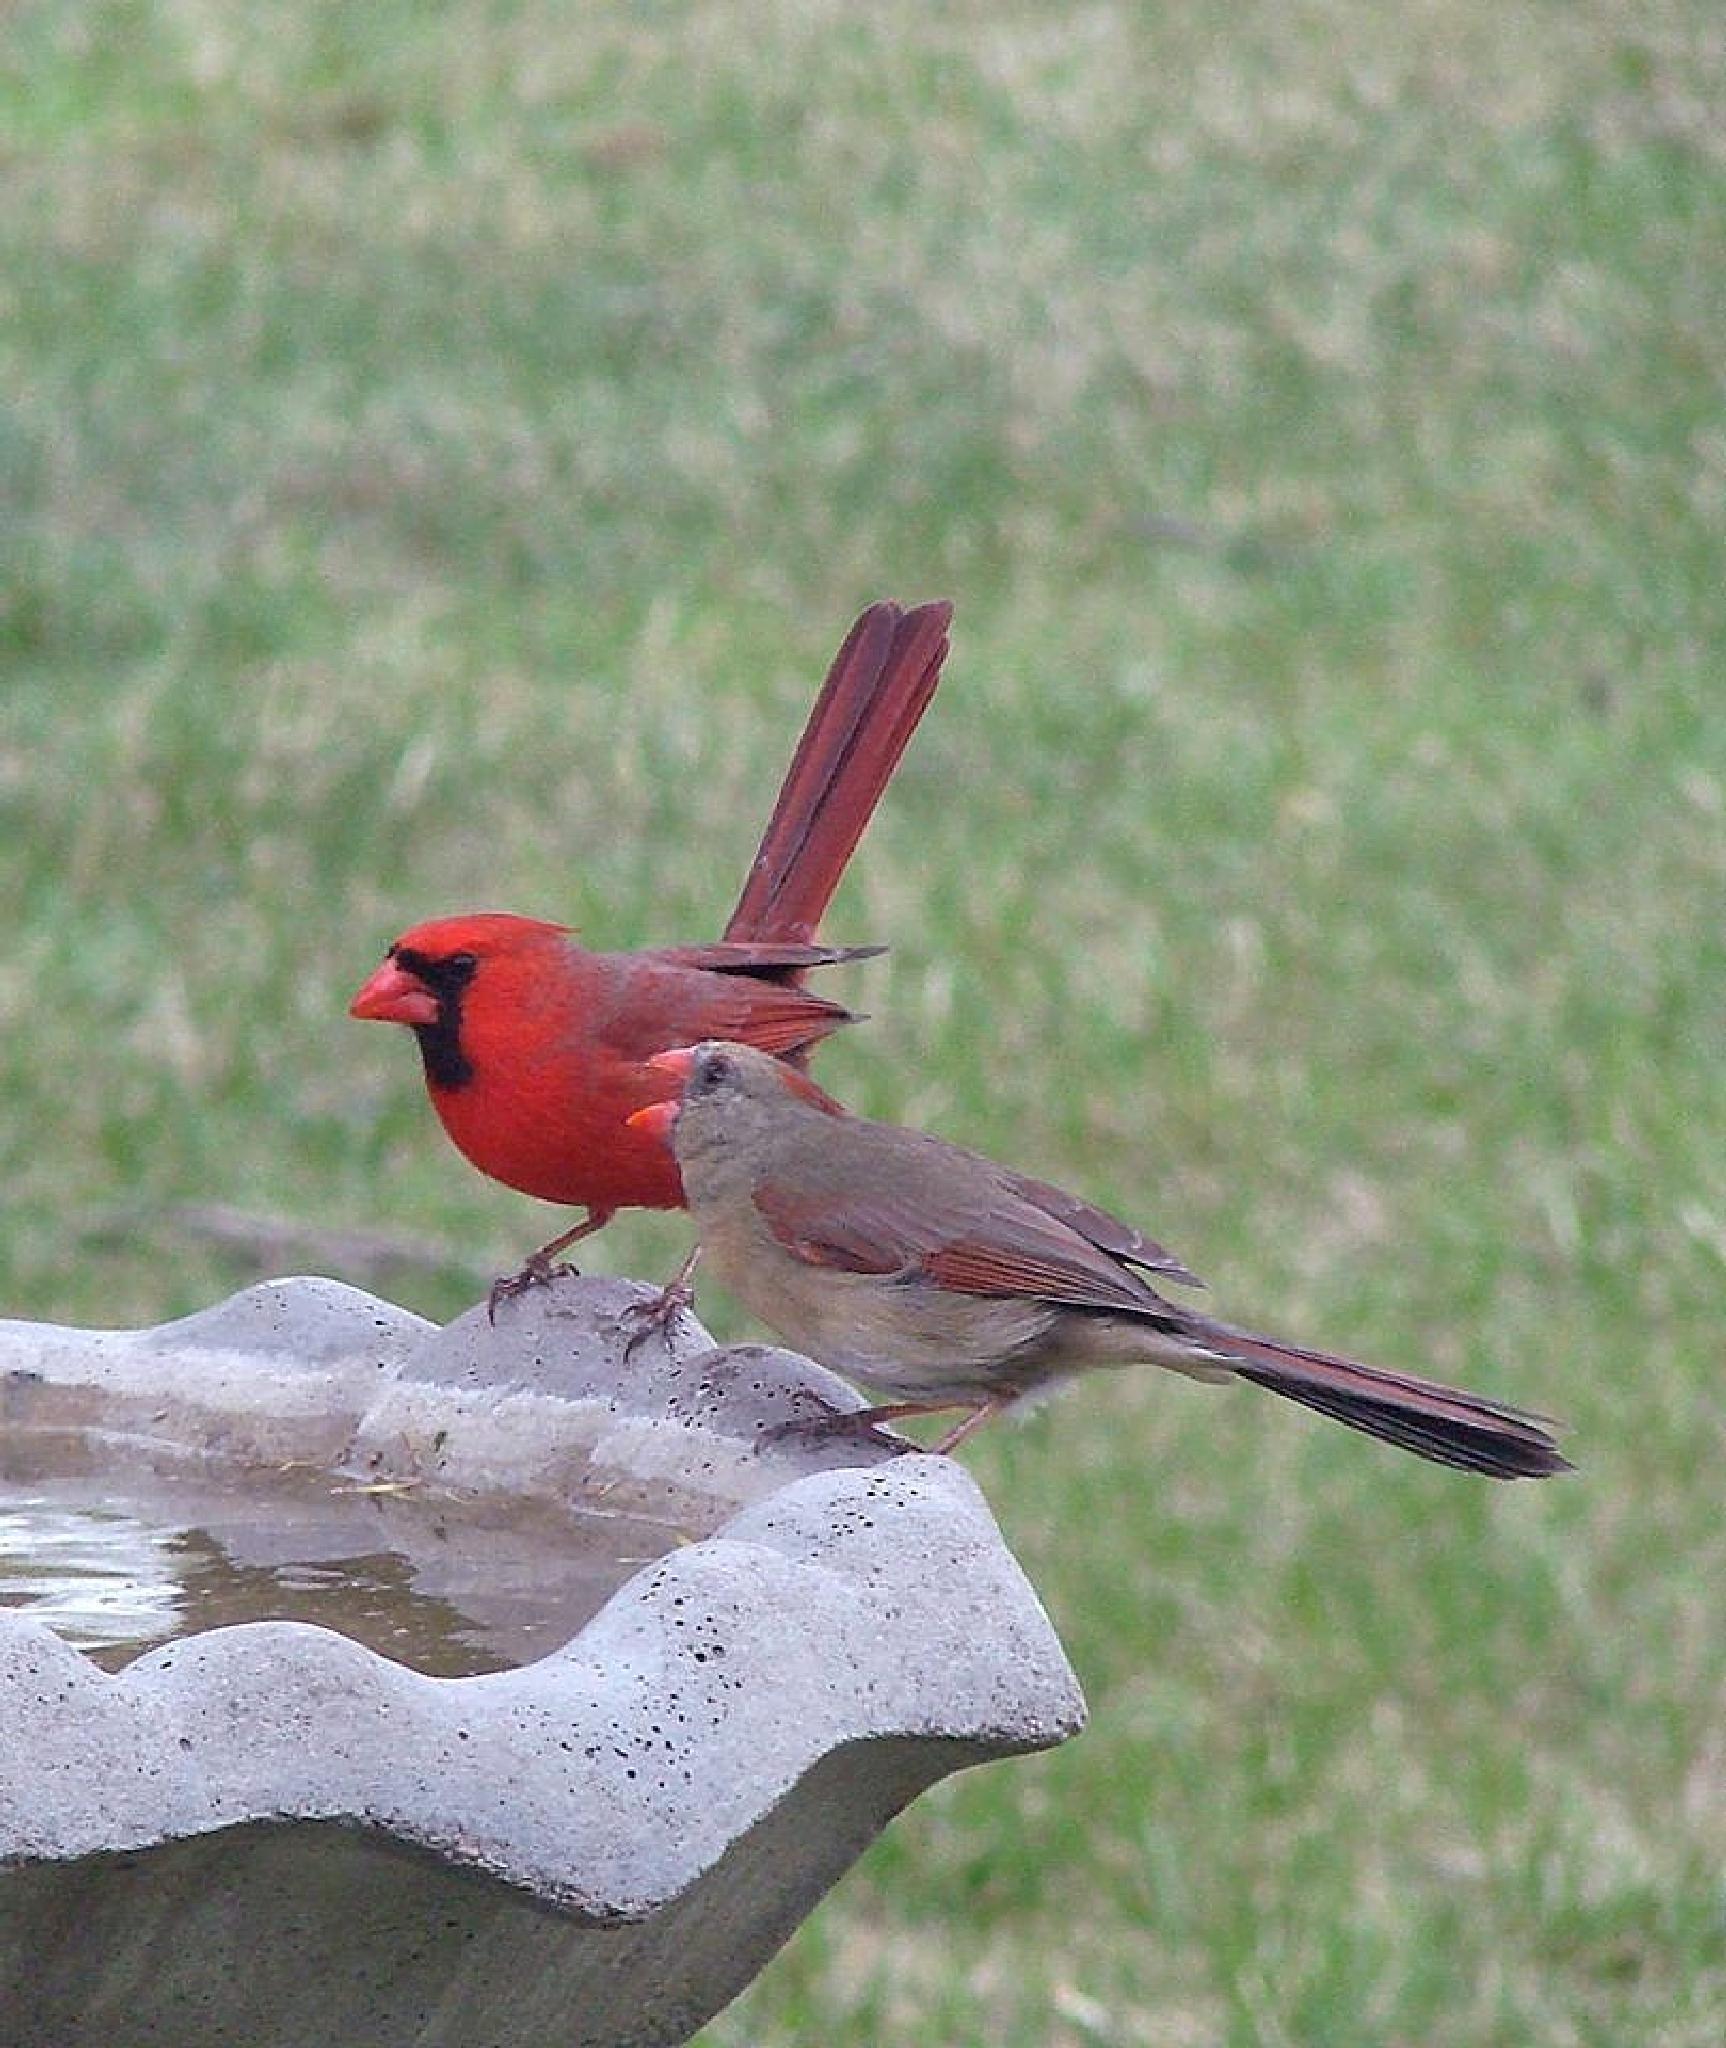 Male & Female Cardinals by pamela.raineri.1